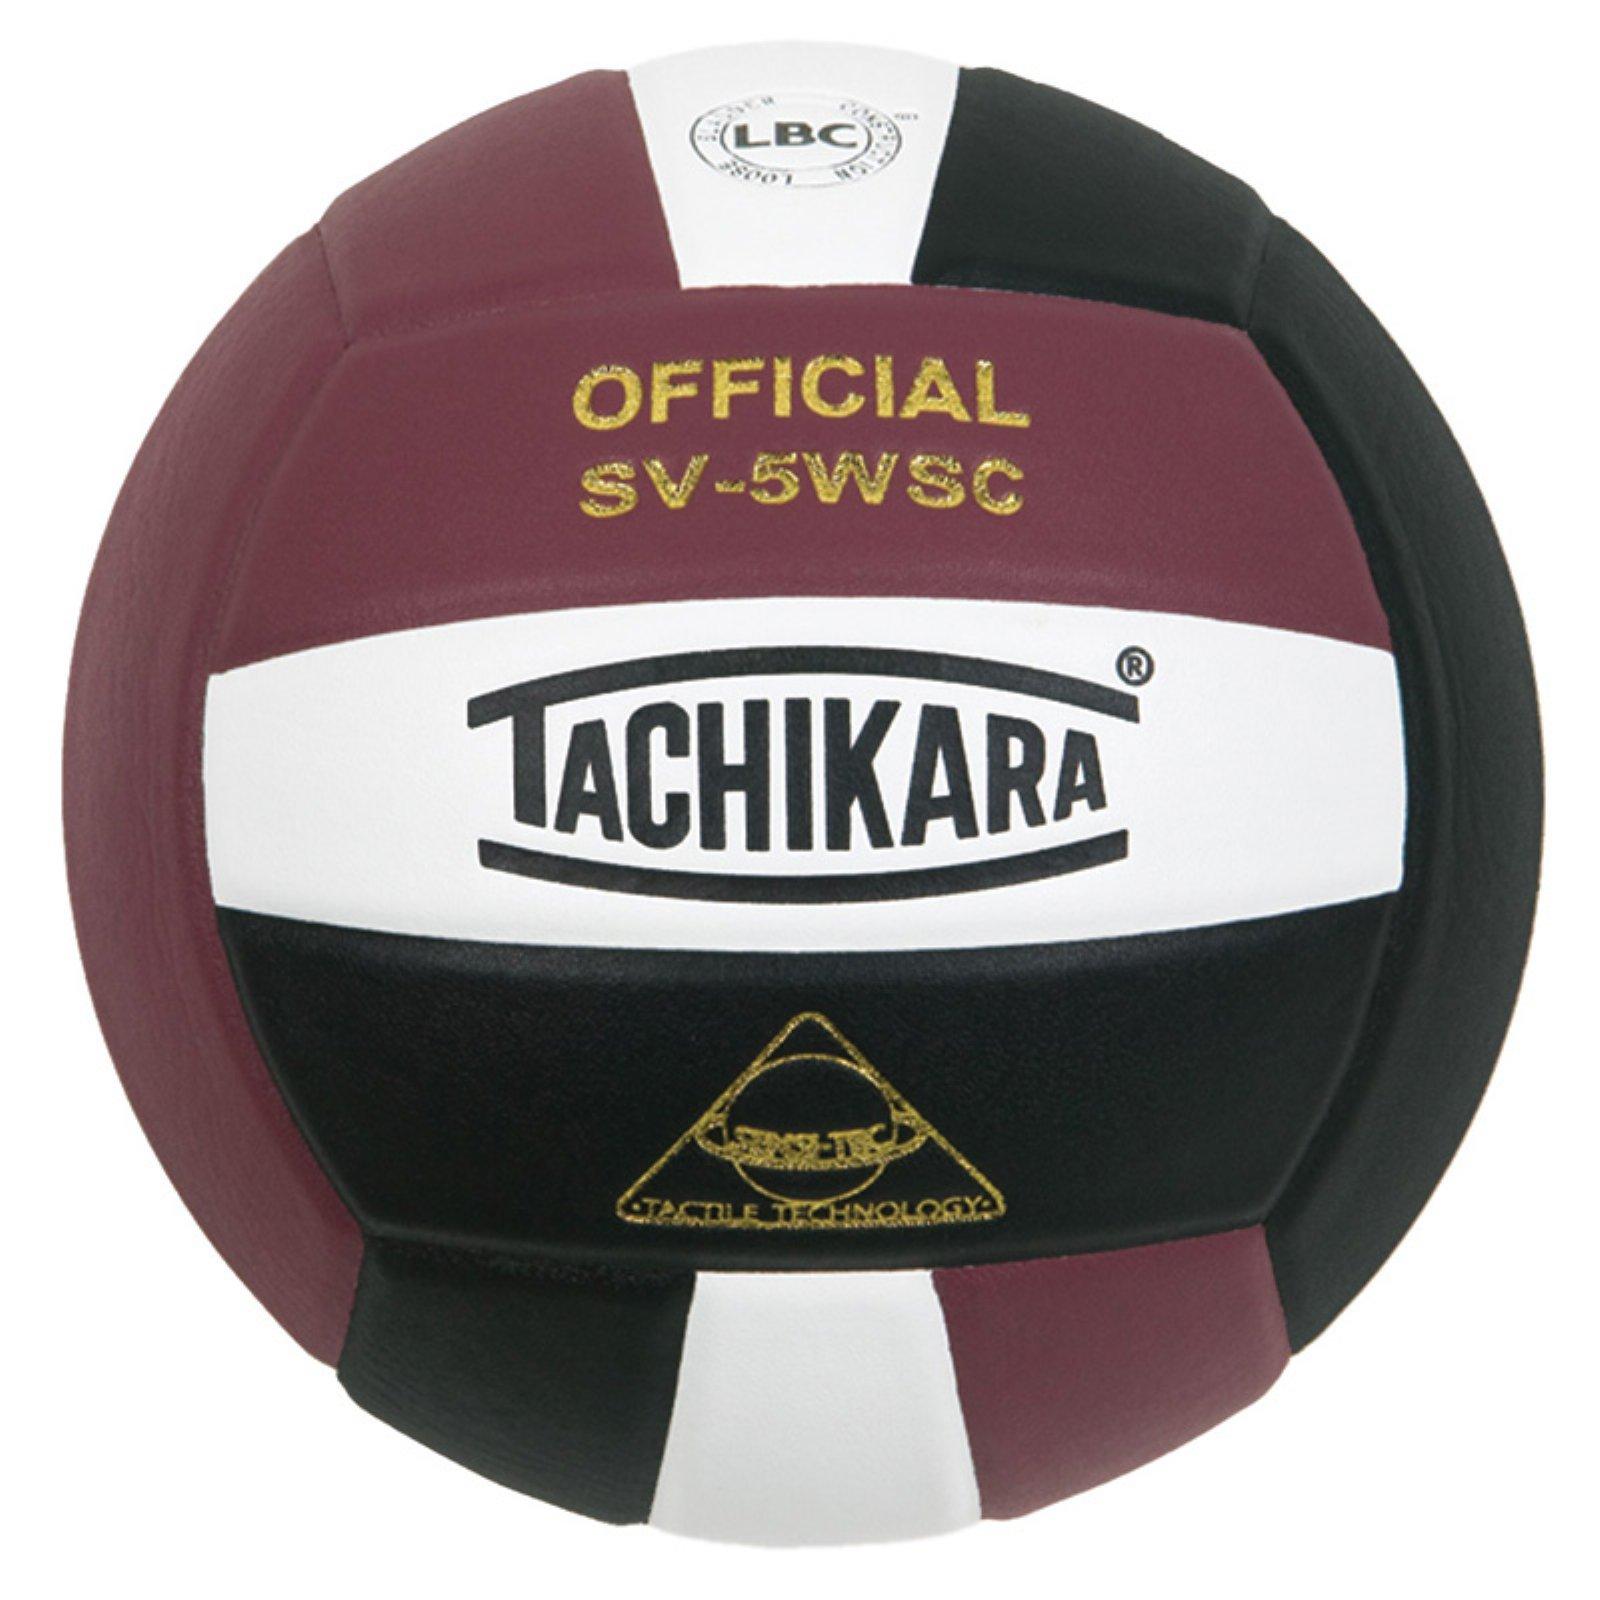 Tachikara Official Sv5w Gold Premium Leather Volleyball Volleyball Indoor Volleyball Volleyball Online